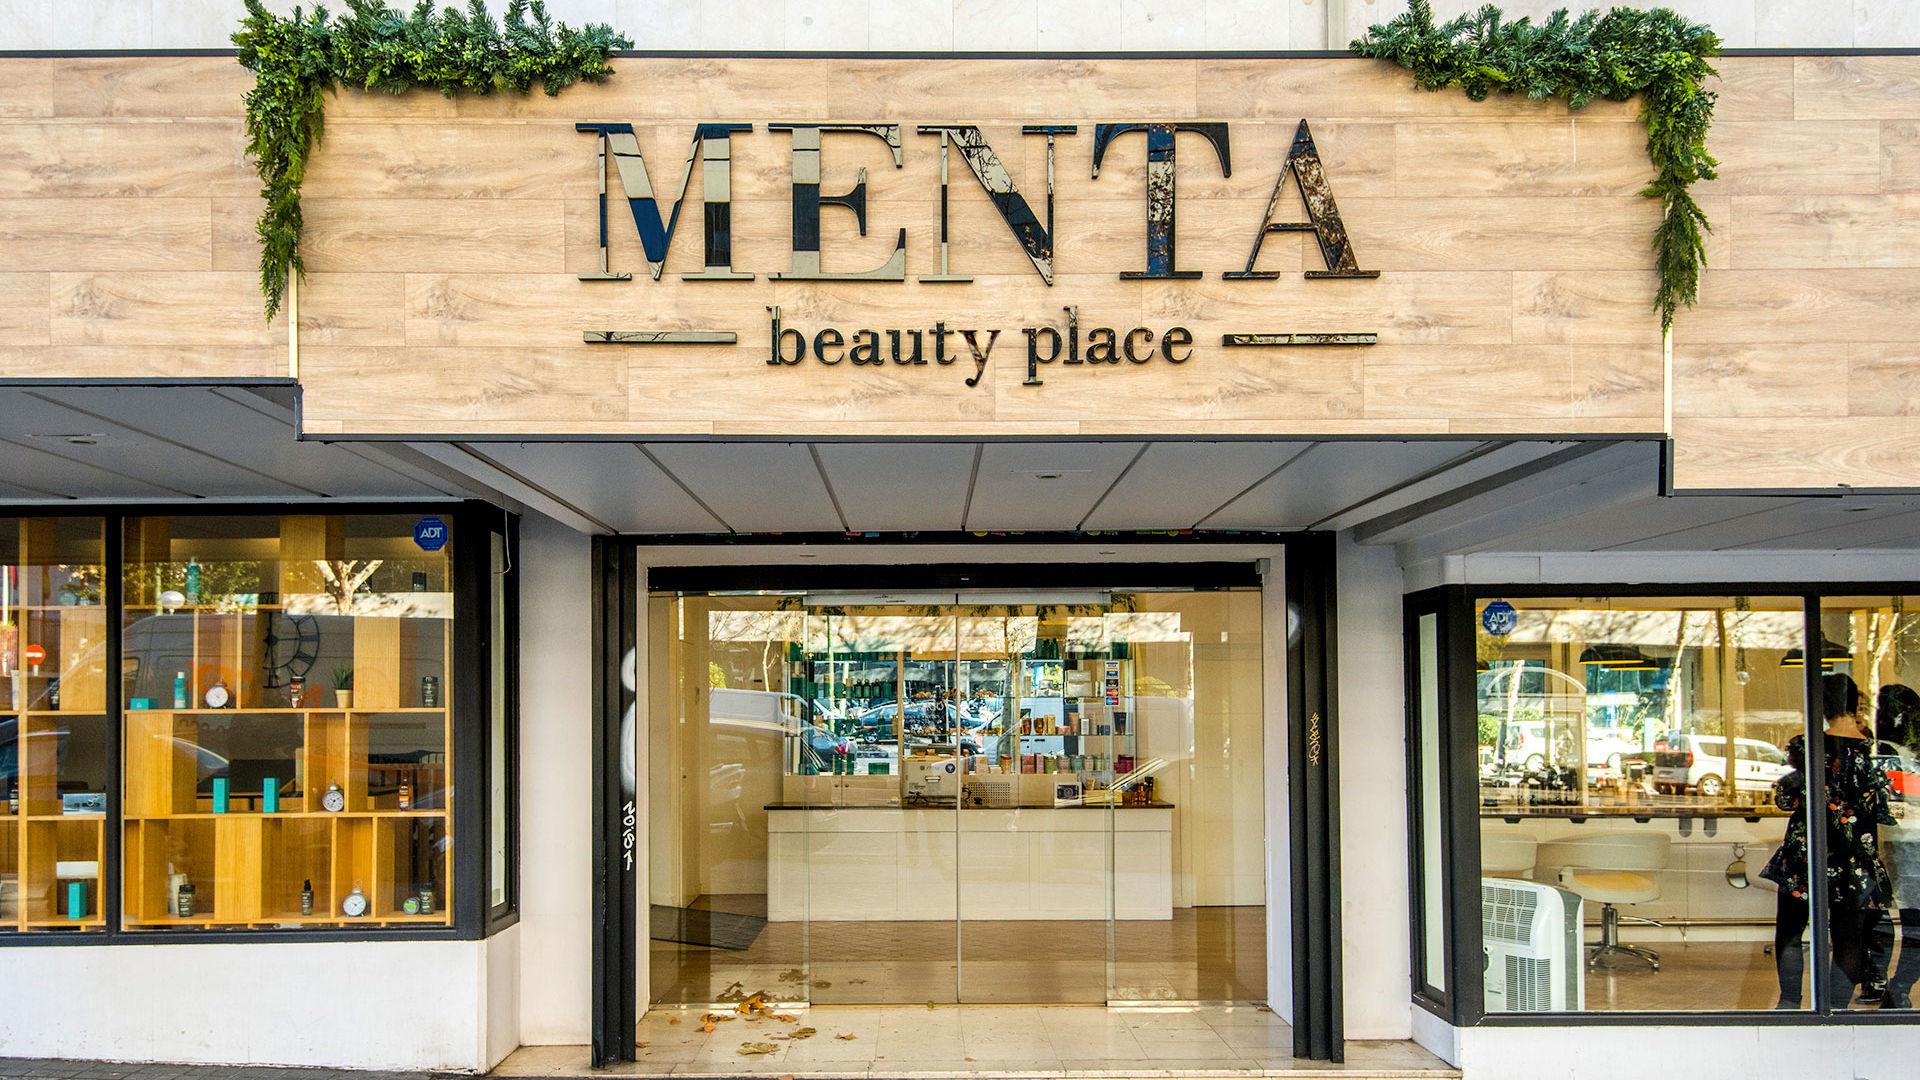 Menta_Beauty_Place_Vergara_SPJ_375310_13